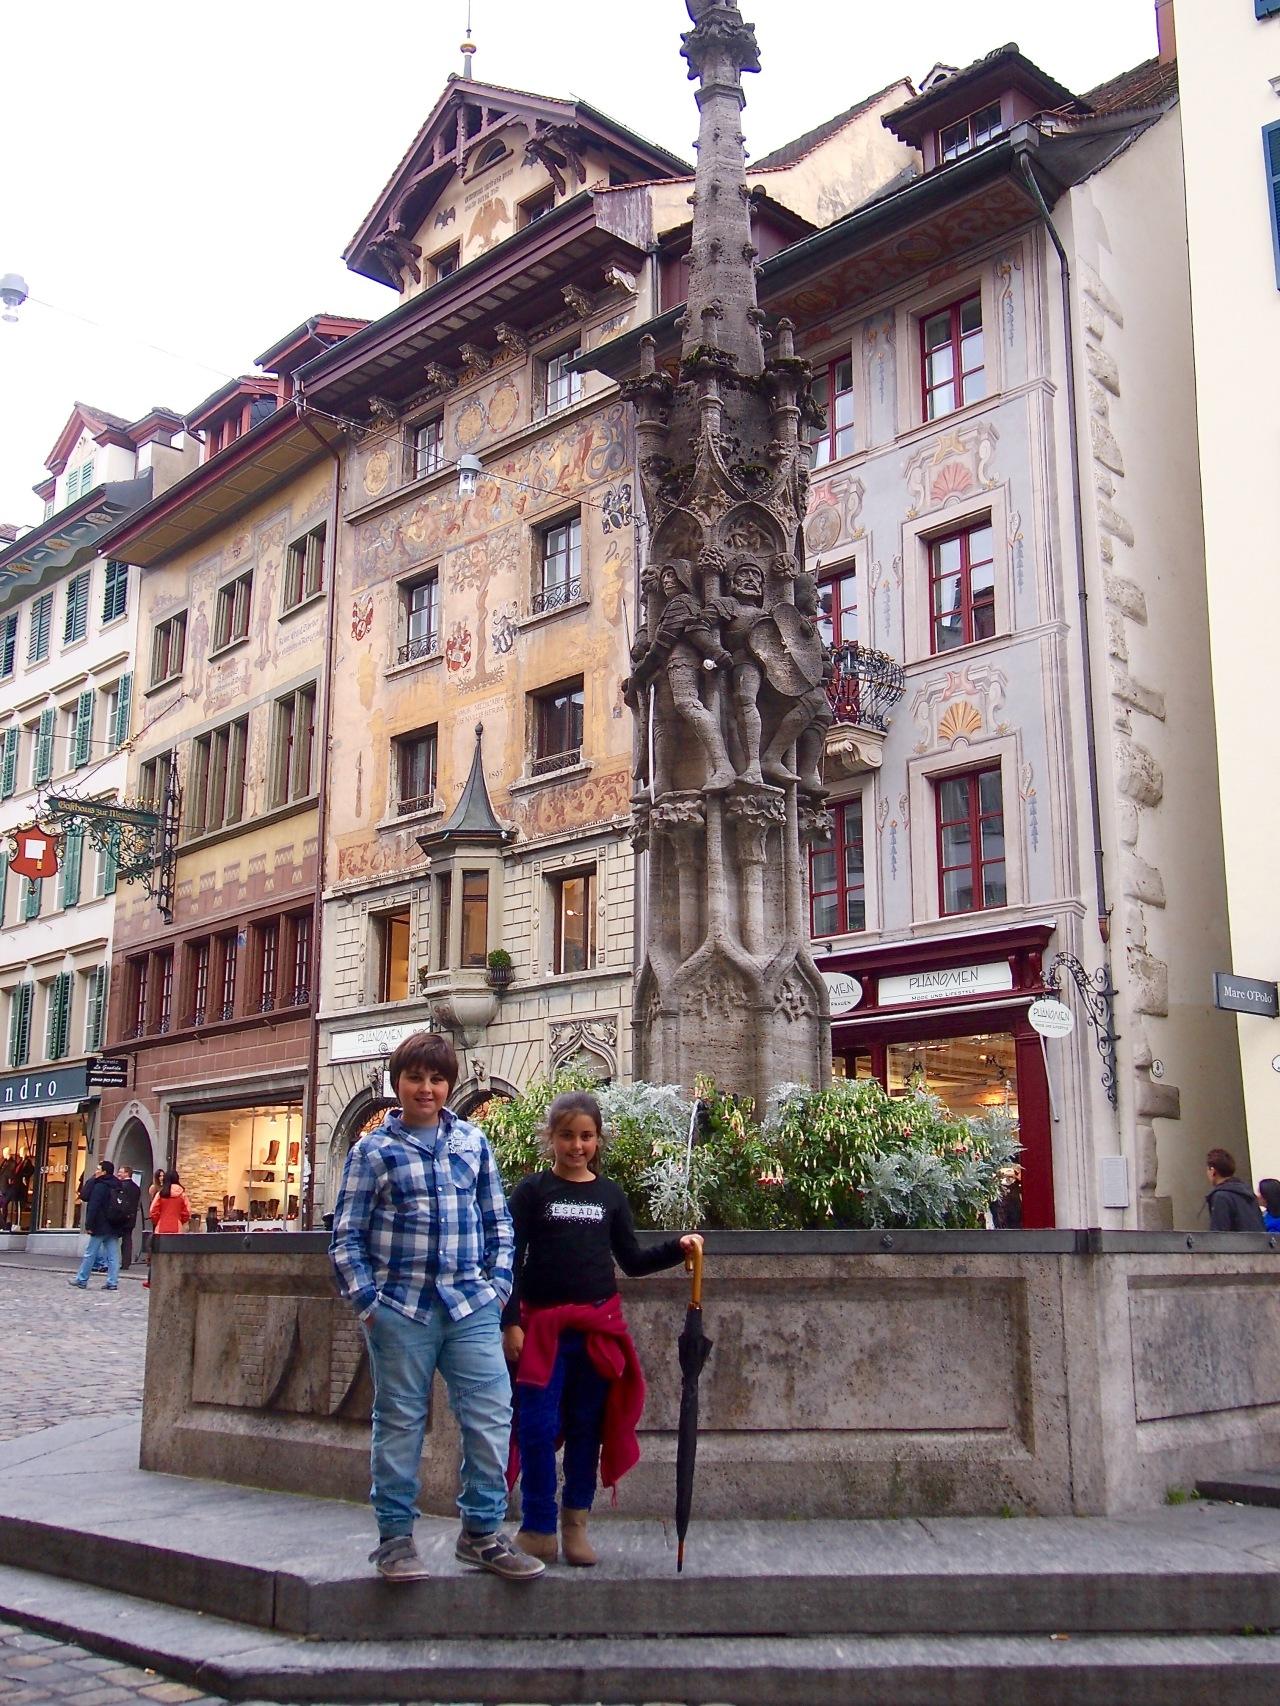 Switzerland – Exploring regal medieval Lucerne and further afield to MountRigi